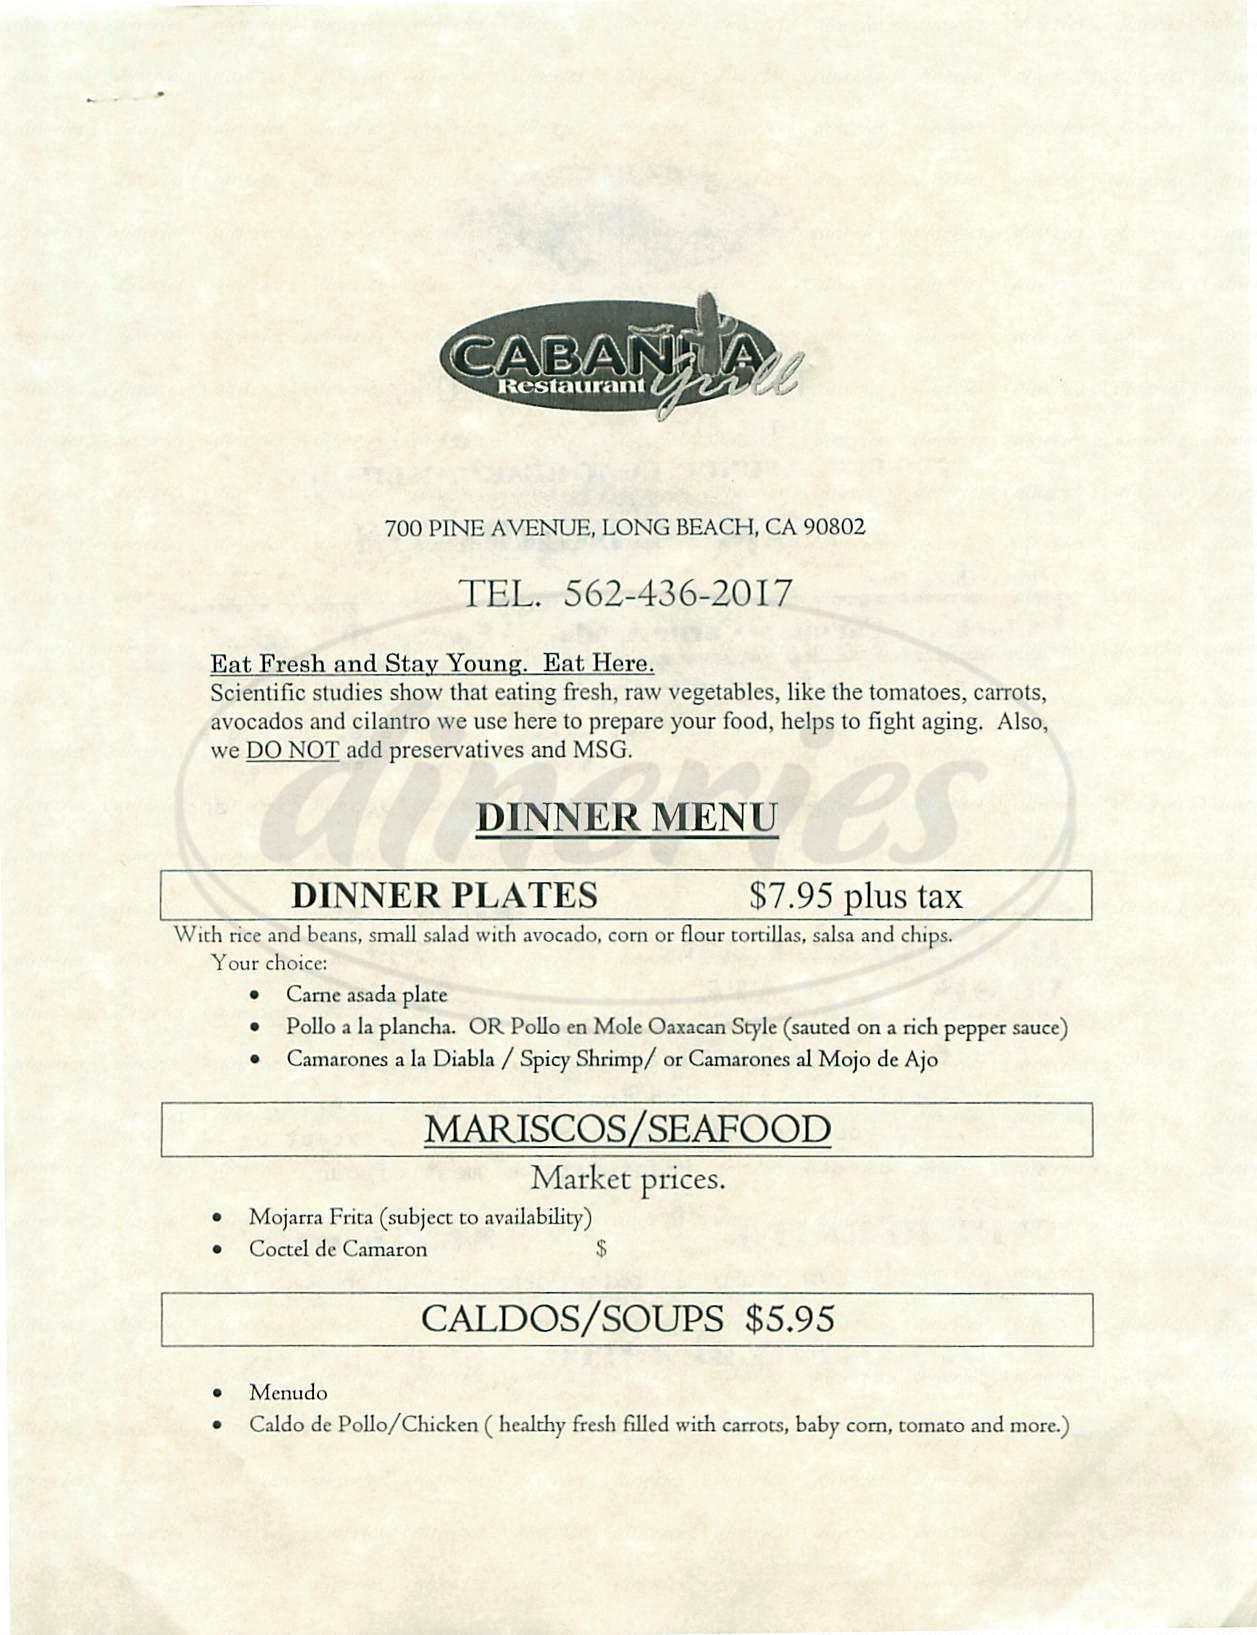 menu for Cabanita Restaurant Grill